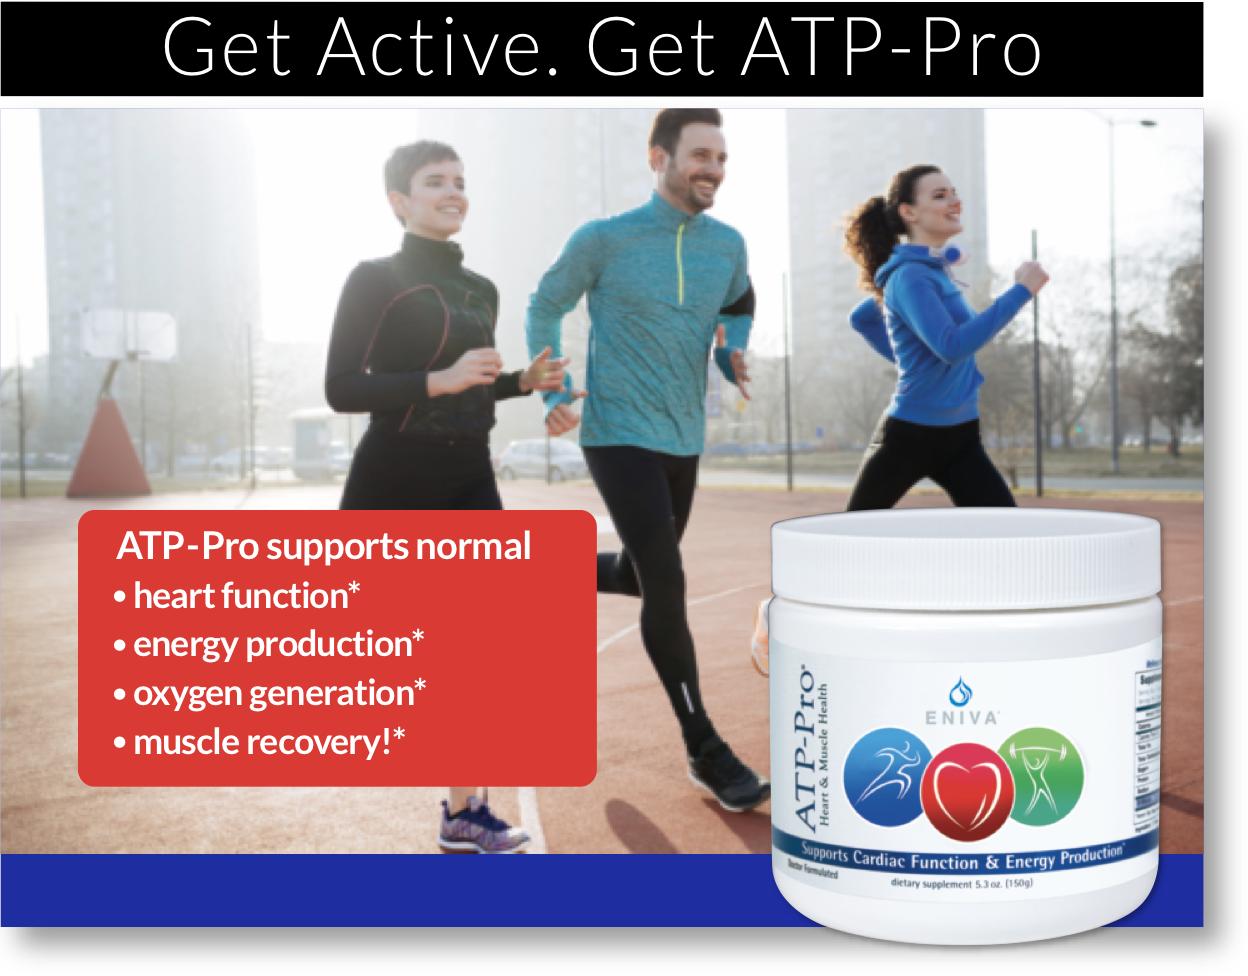 atp-pro.png